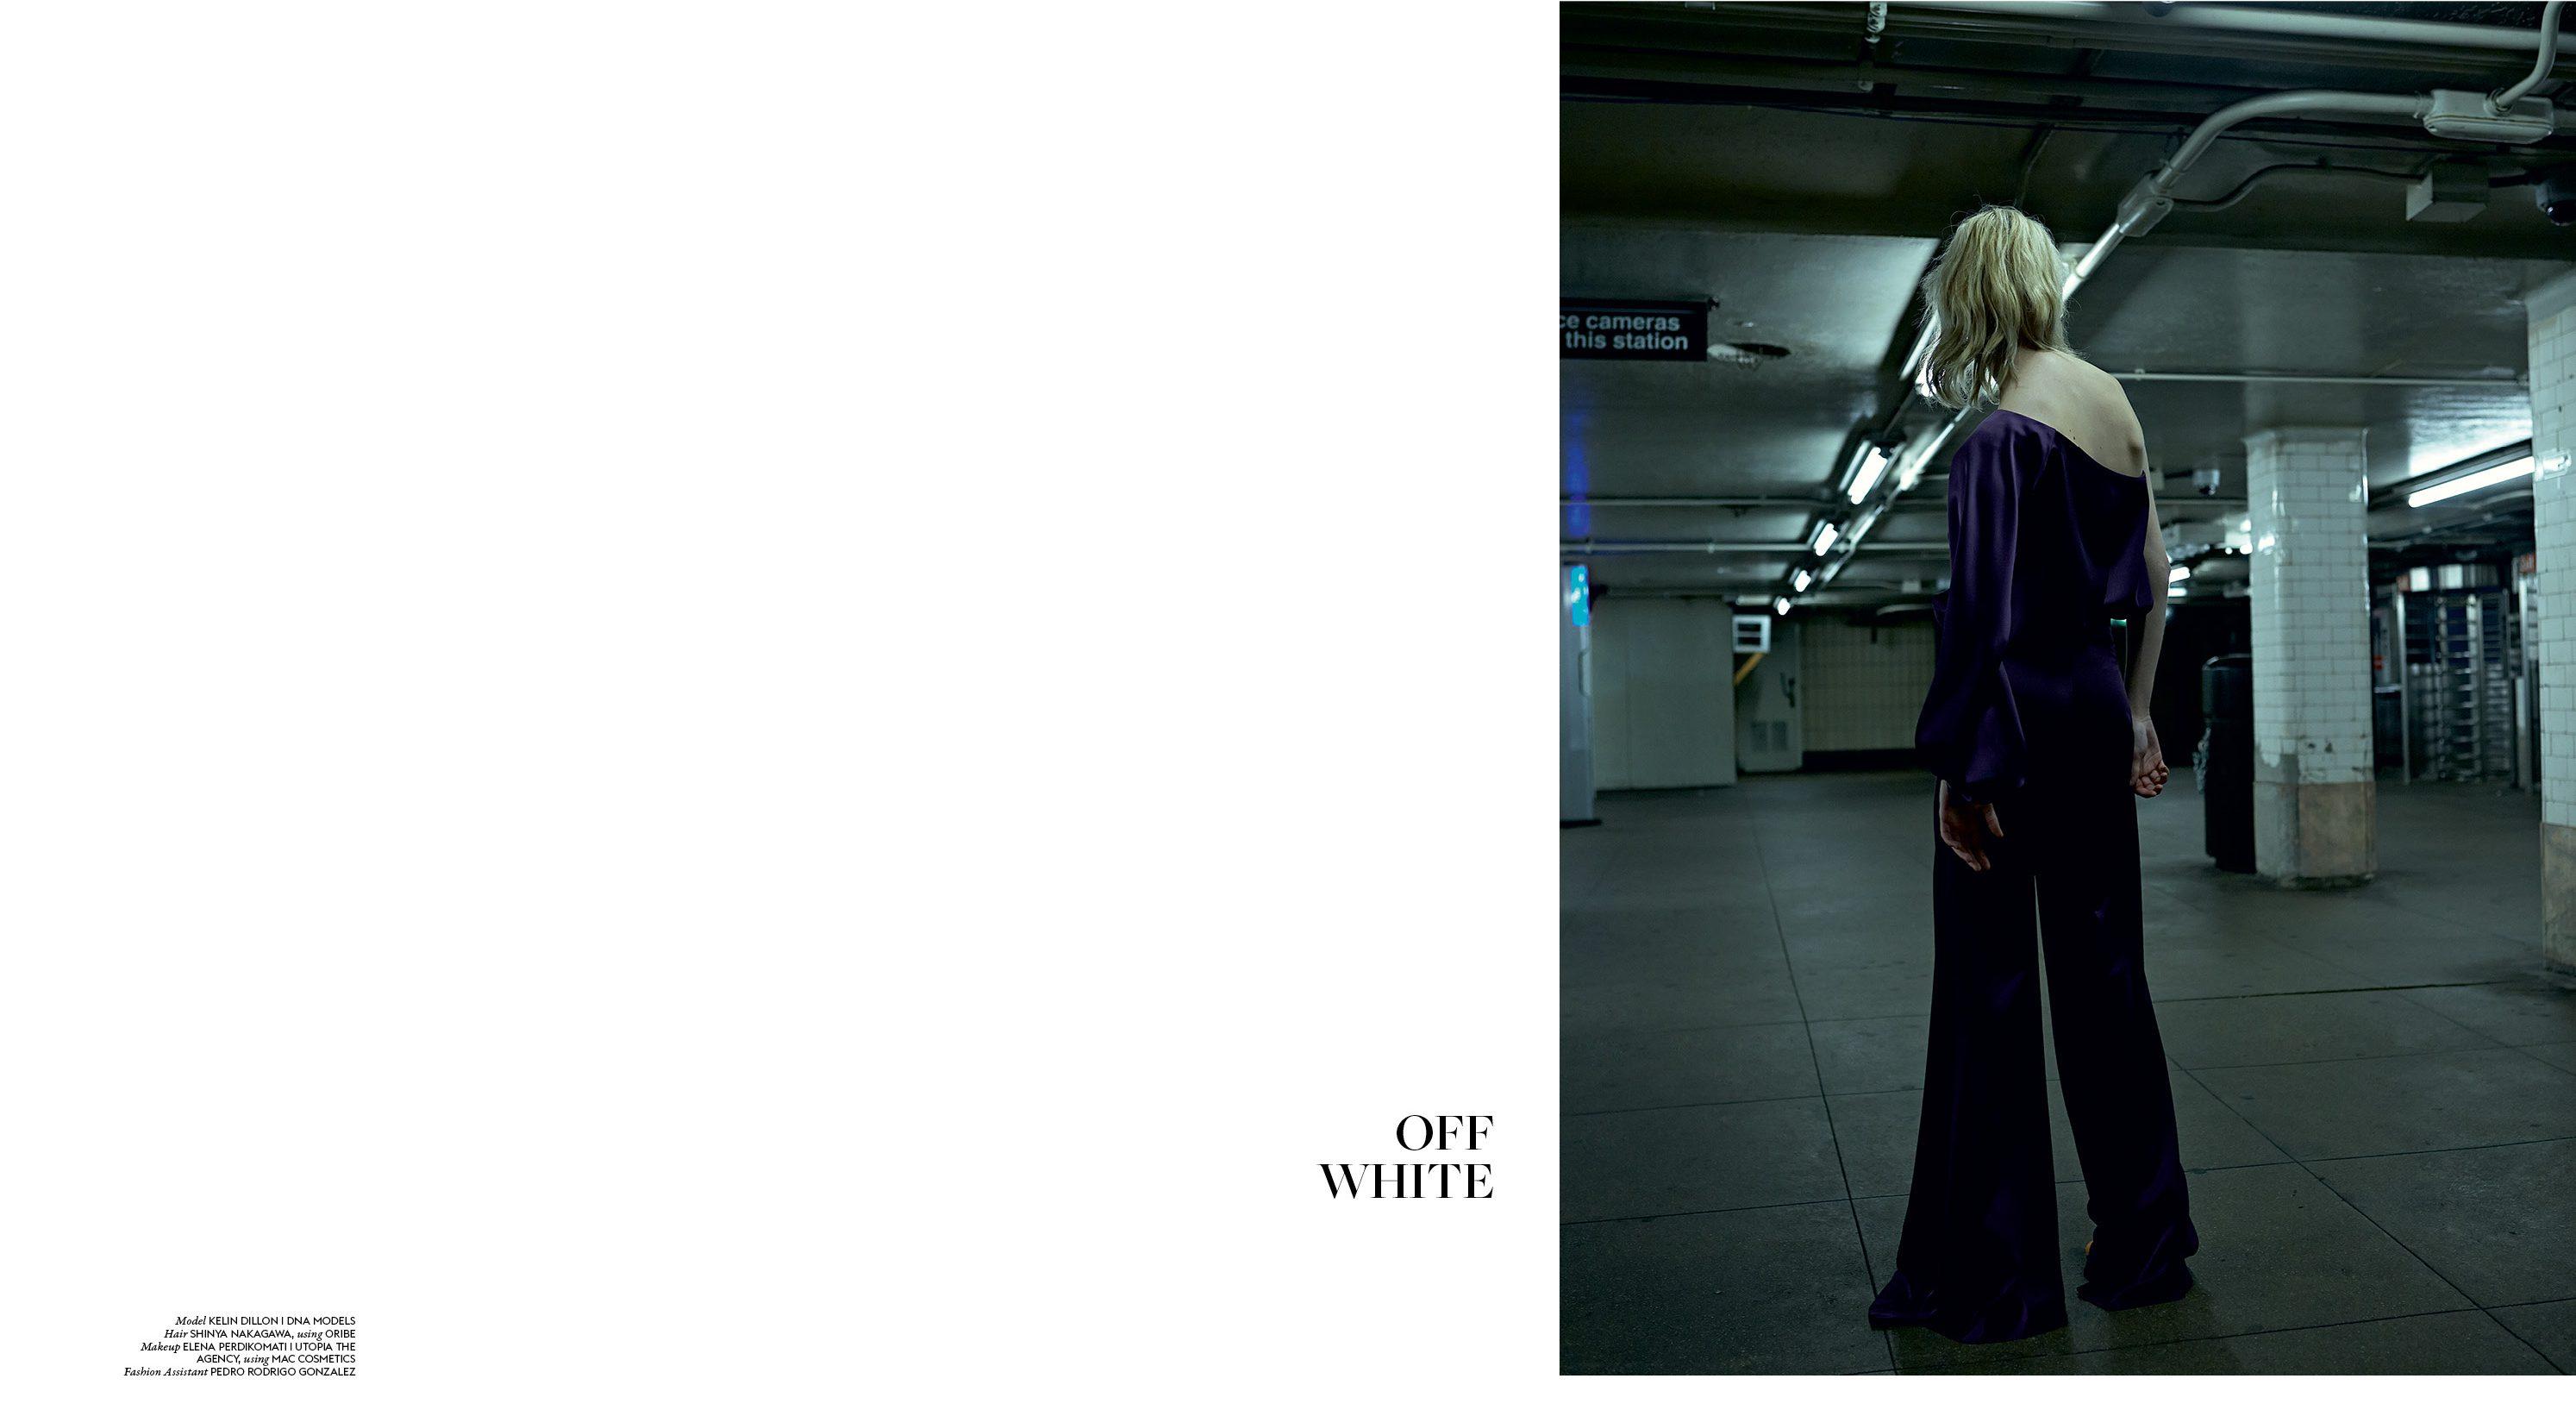 The Metro - The Impression Magazine Vol 2.